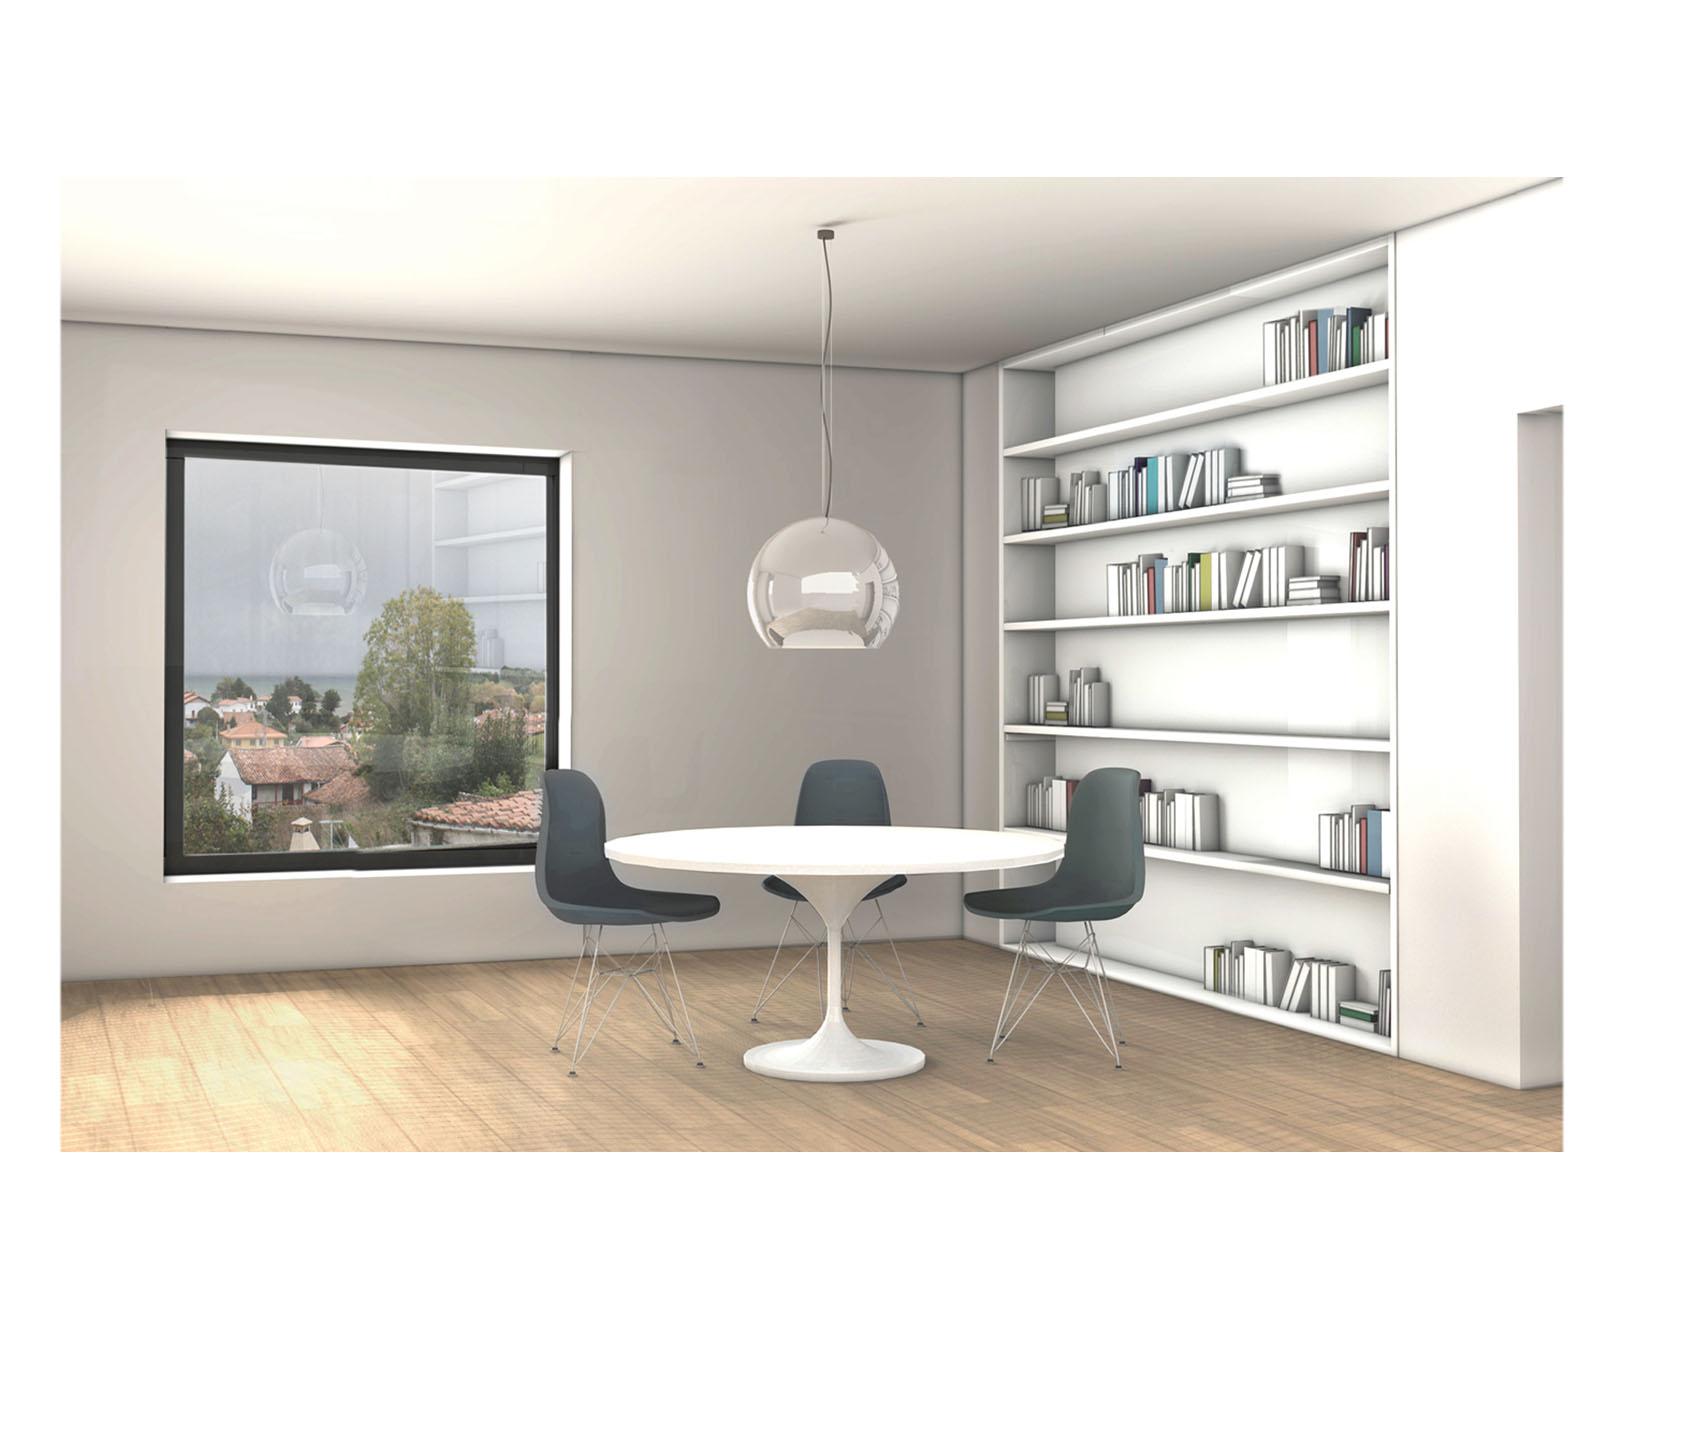 Private House-Celorio-Image 04.jpg